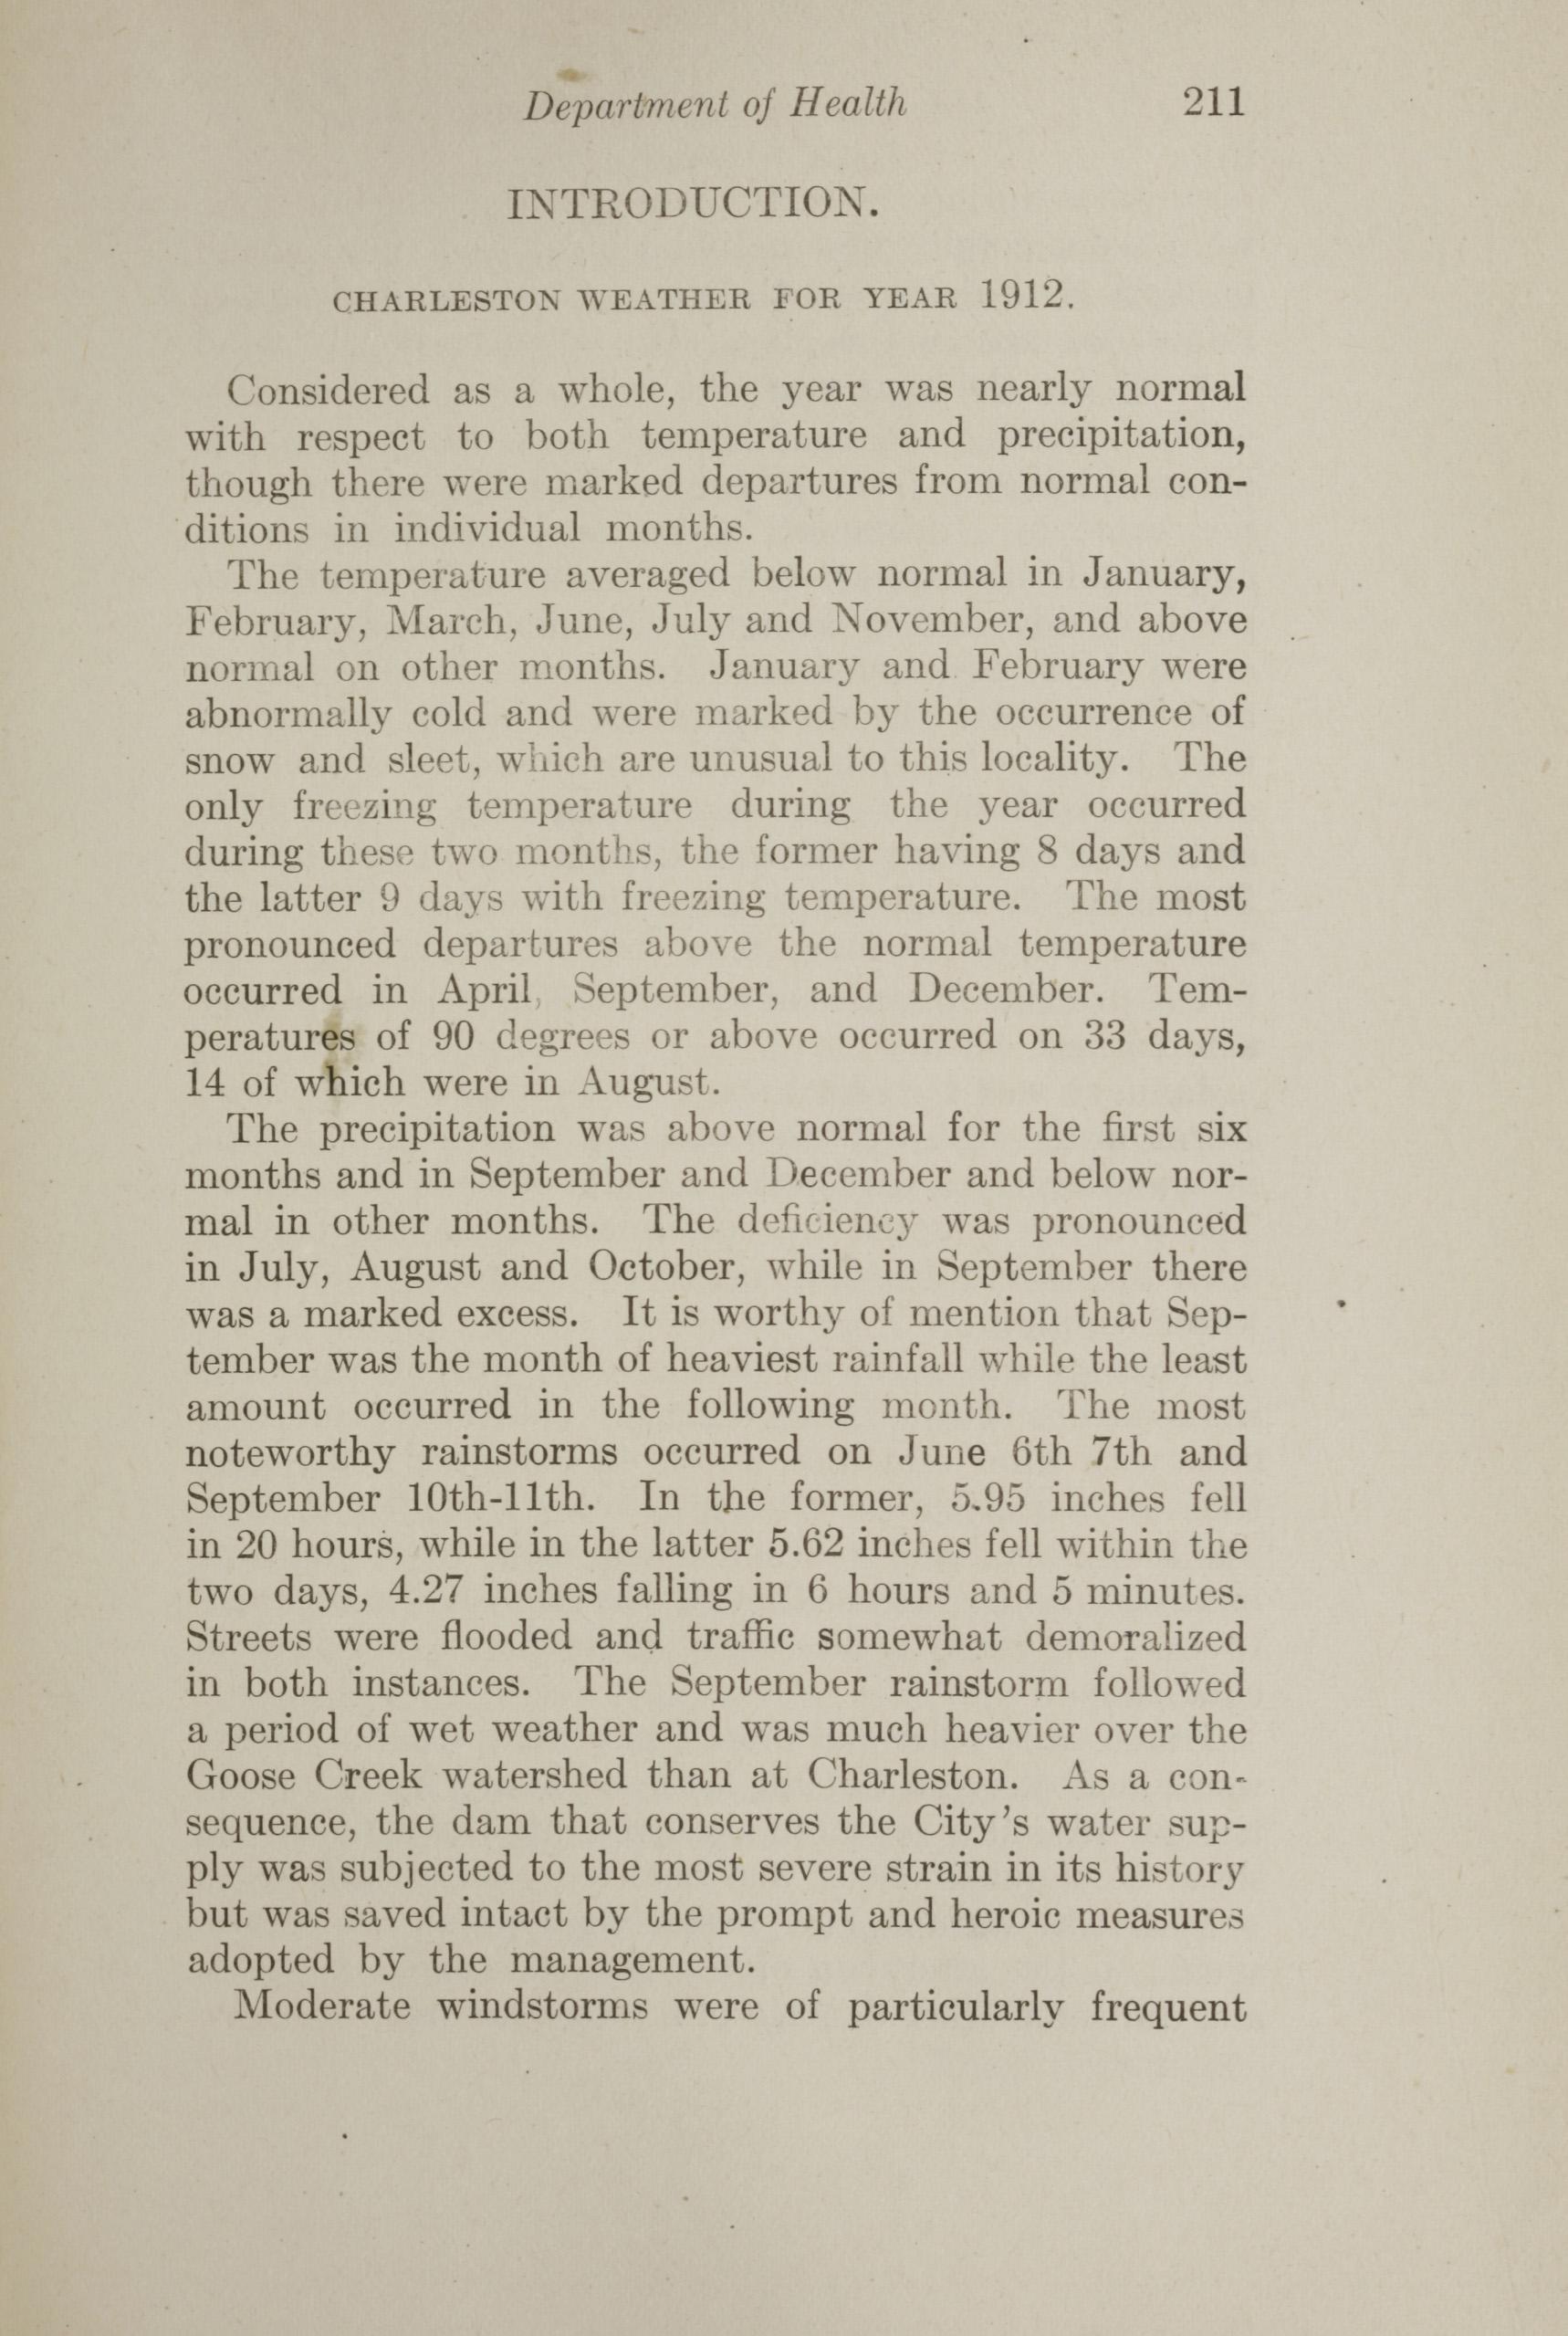 Charleston Yearbook, 1912, page 211